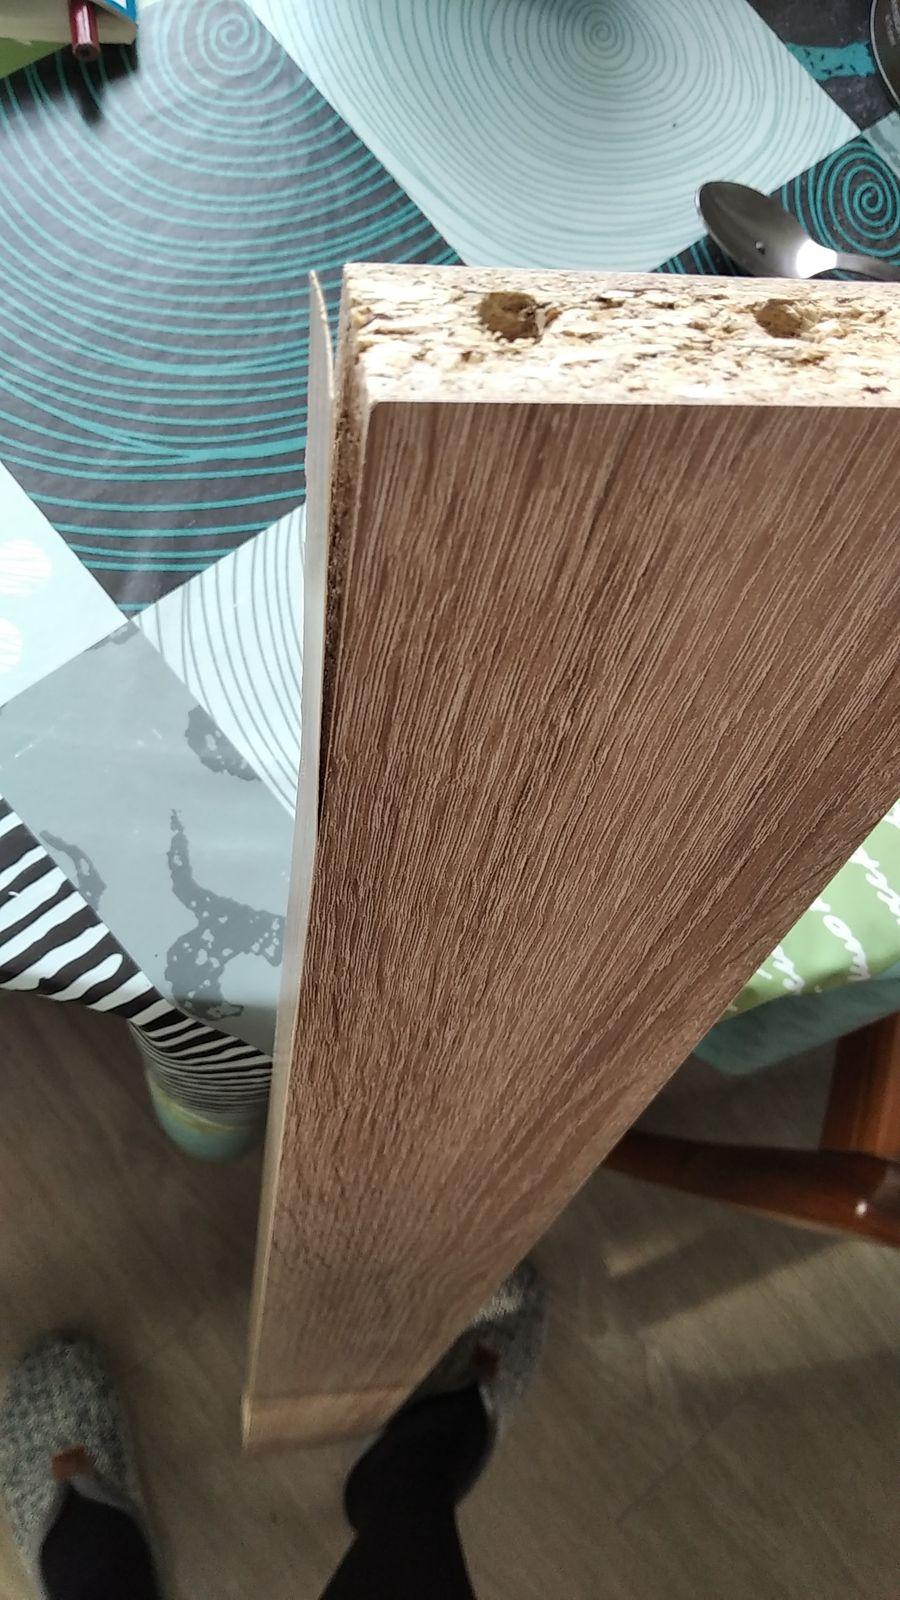 TABLE TENOR DE CHEZ ALINEA...#table-a-rallonge, #table extensible(avis, conseils de montage)